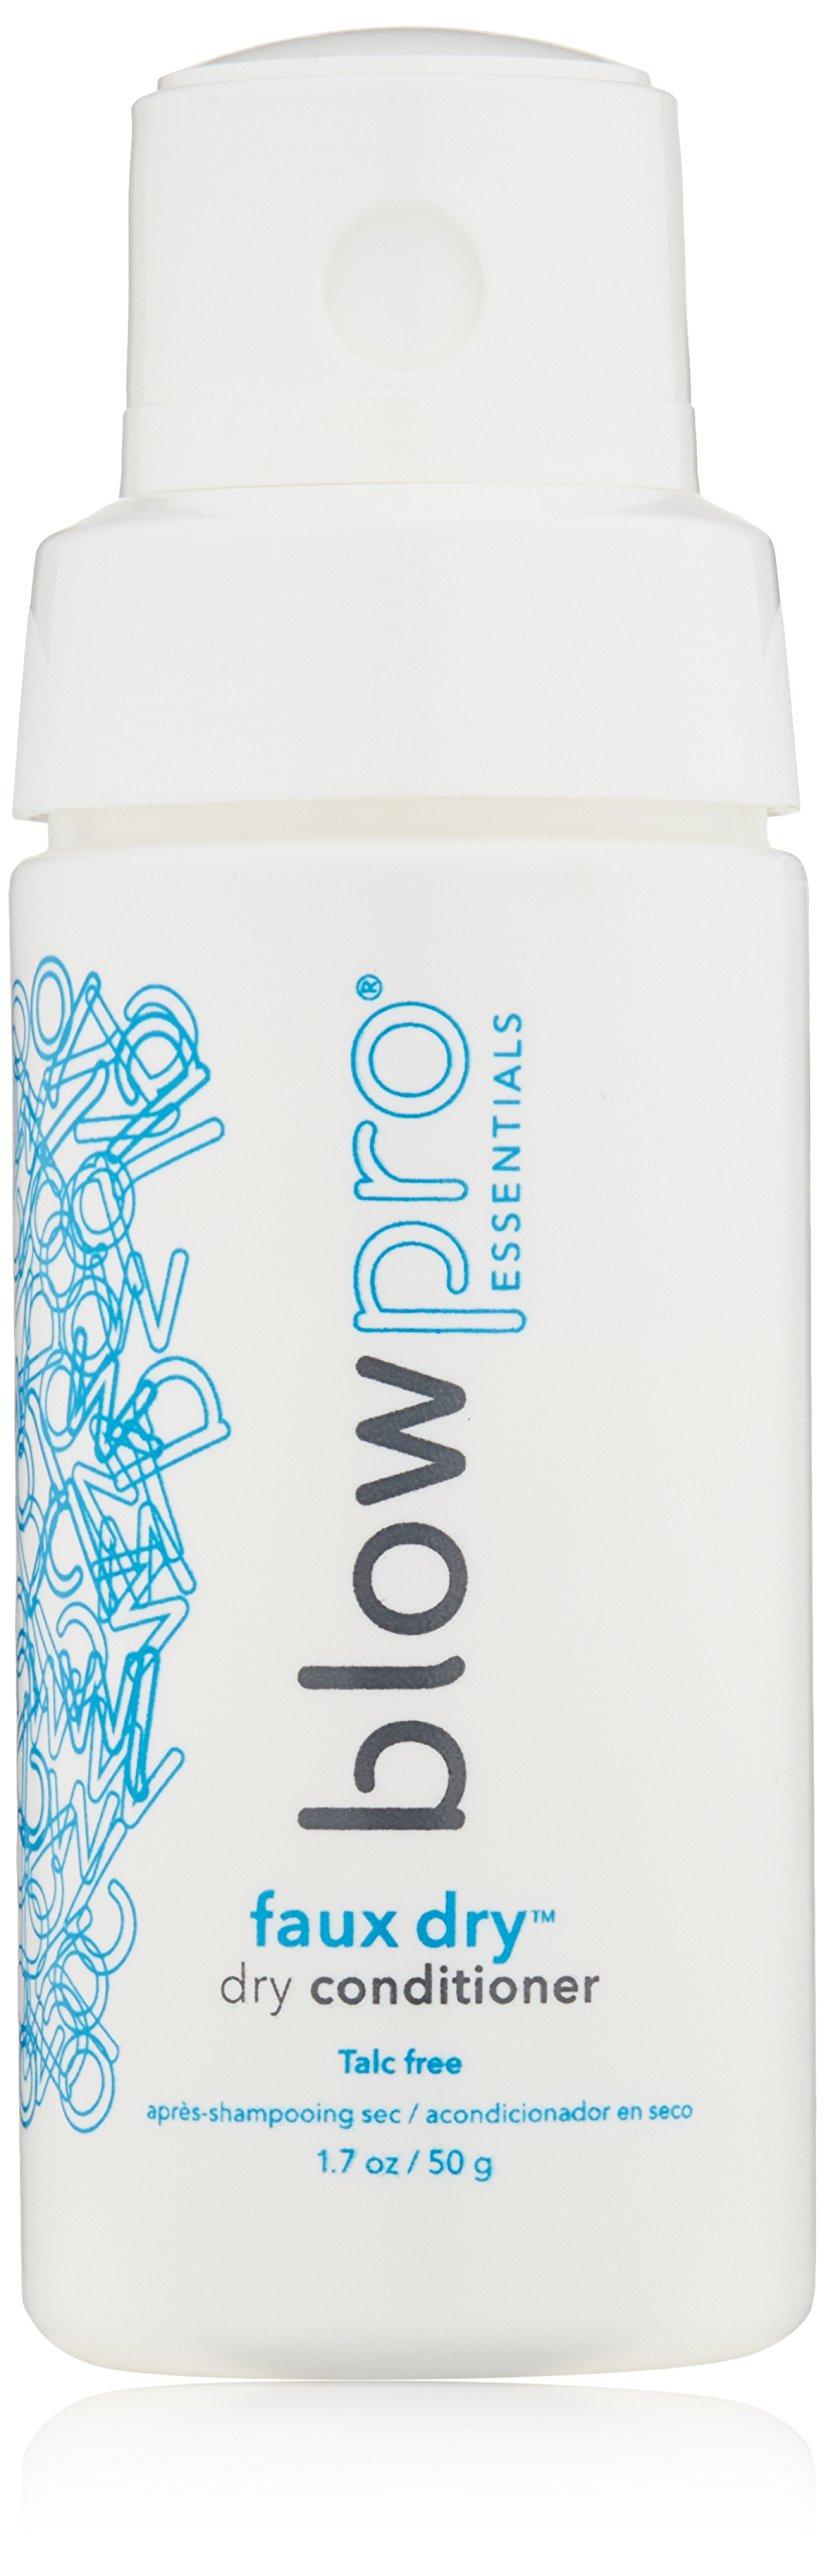 blowpro Faux Dry Conditioner, 1.7 Oz